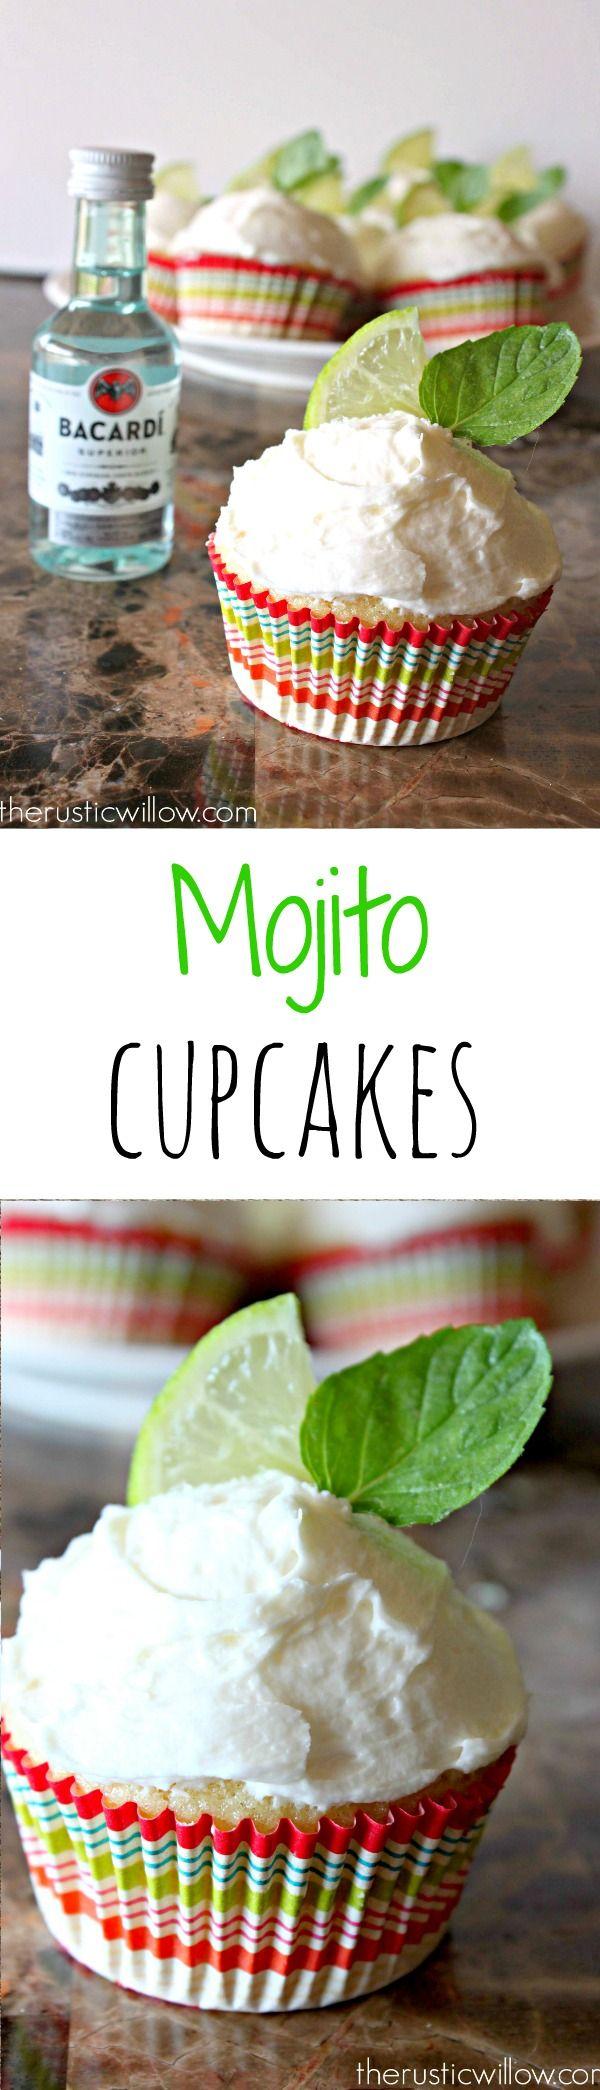 Mojito cupcakes | therusticwillow.com